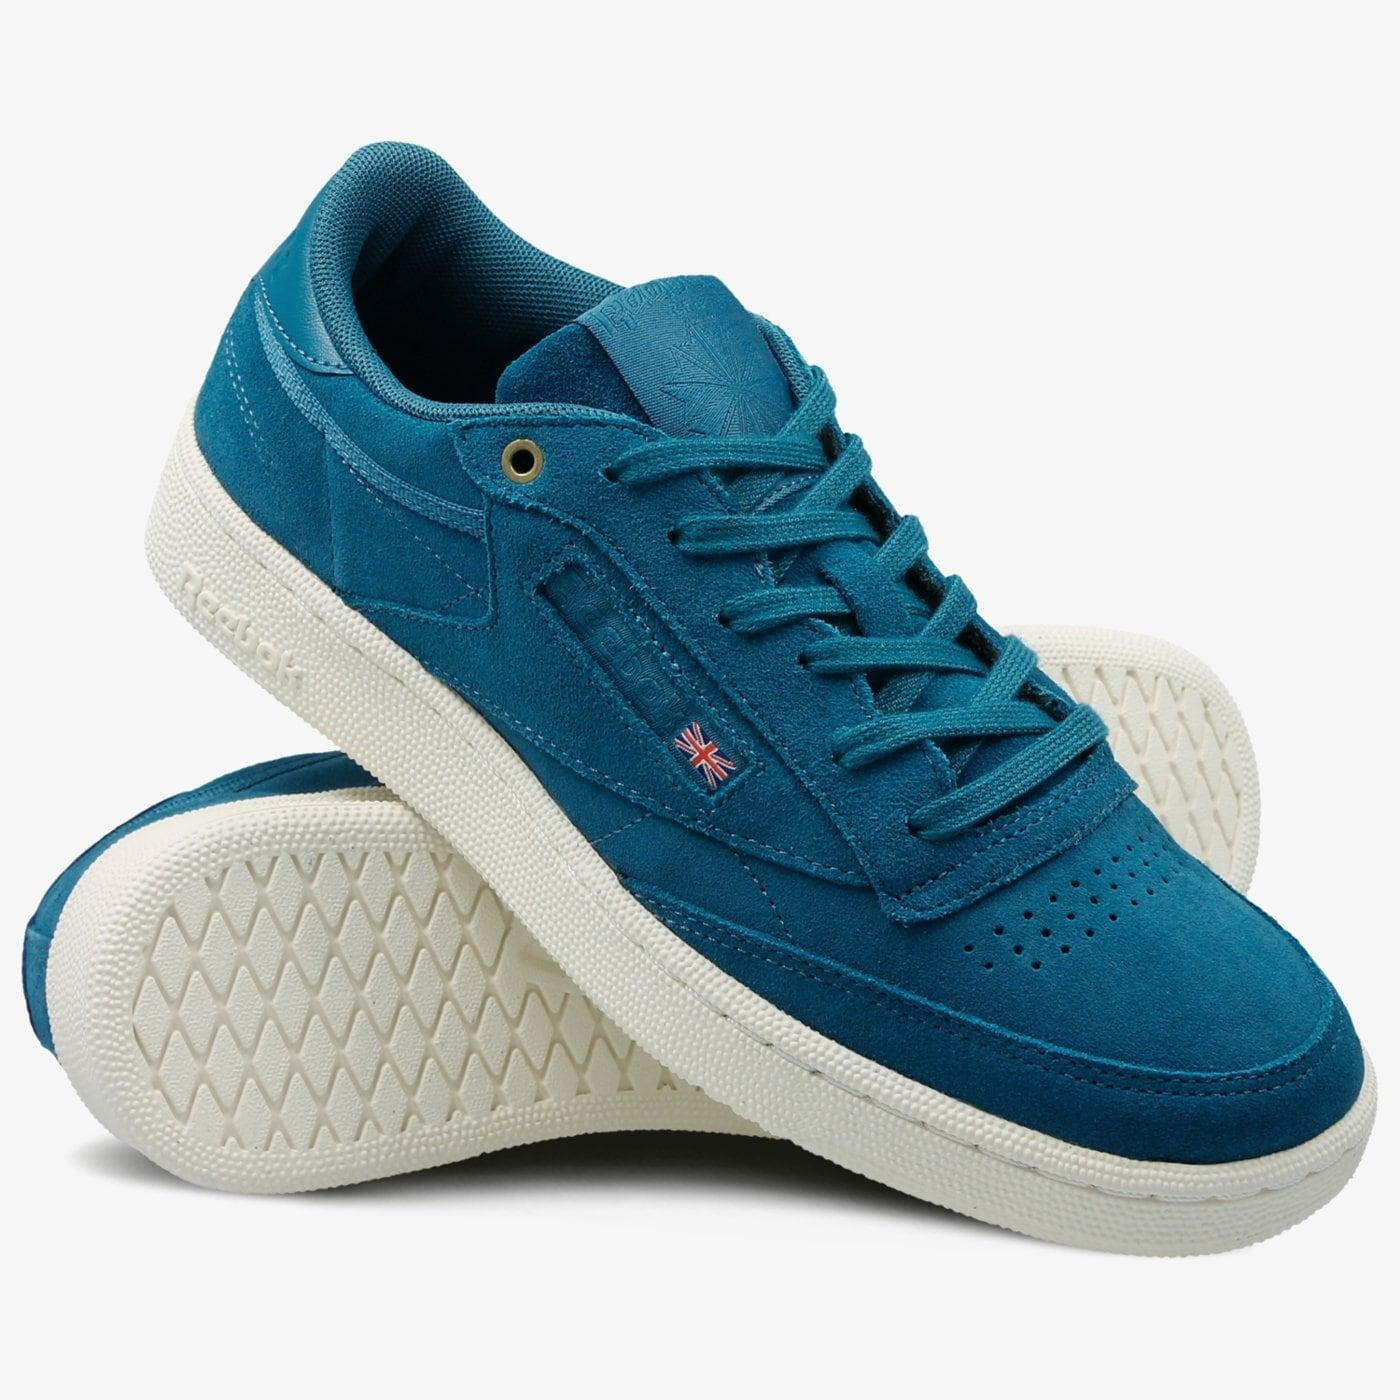 Sizeer Sneaker-Sale mit 15% extra Rabatt, z.B. Reebok Club C 85 'Montana Cans' (Gr. 38-40)